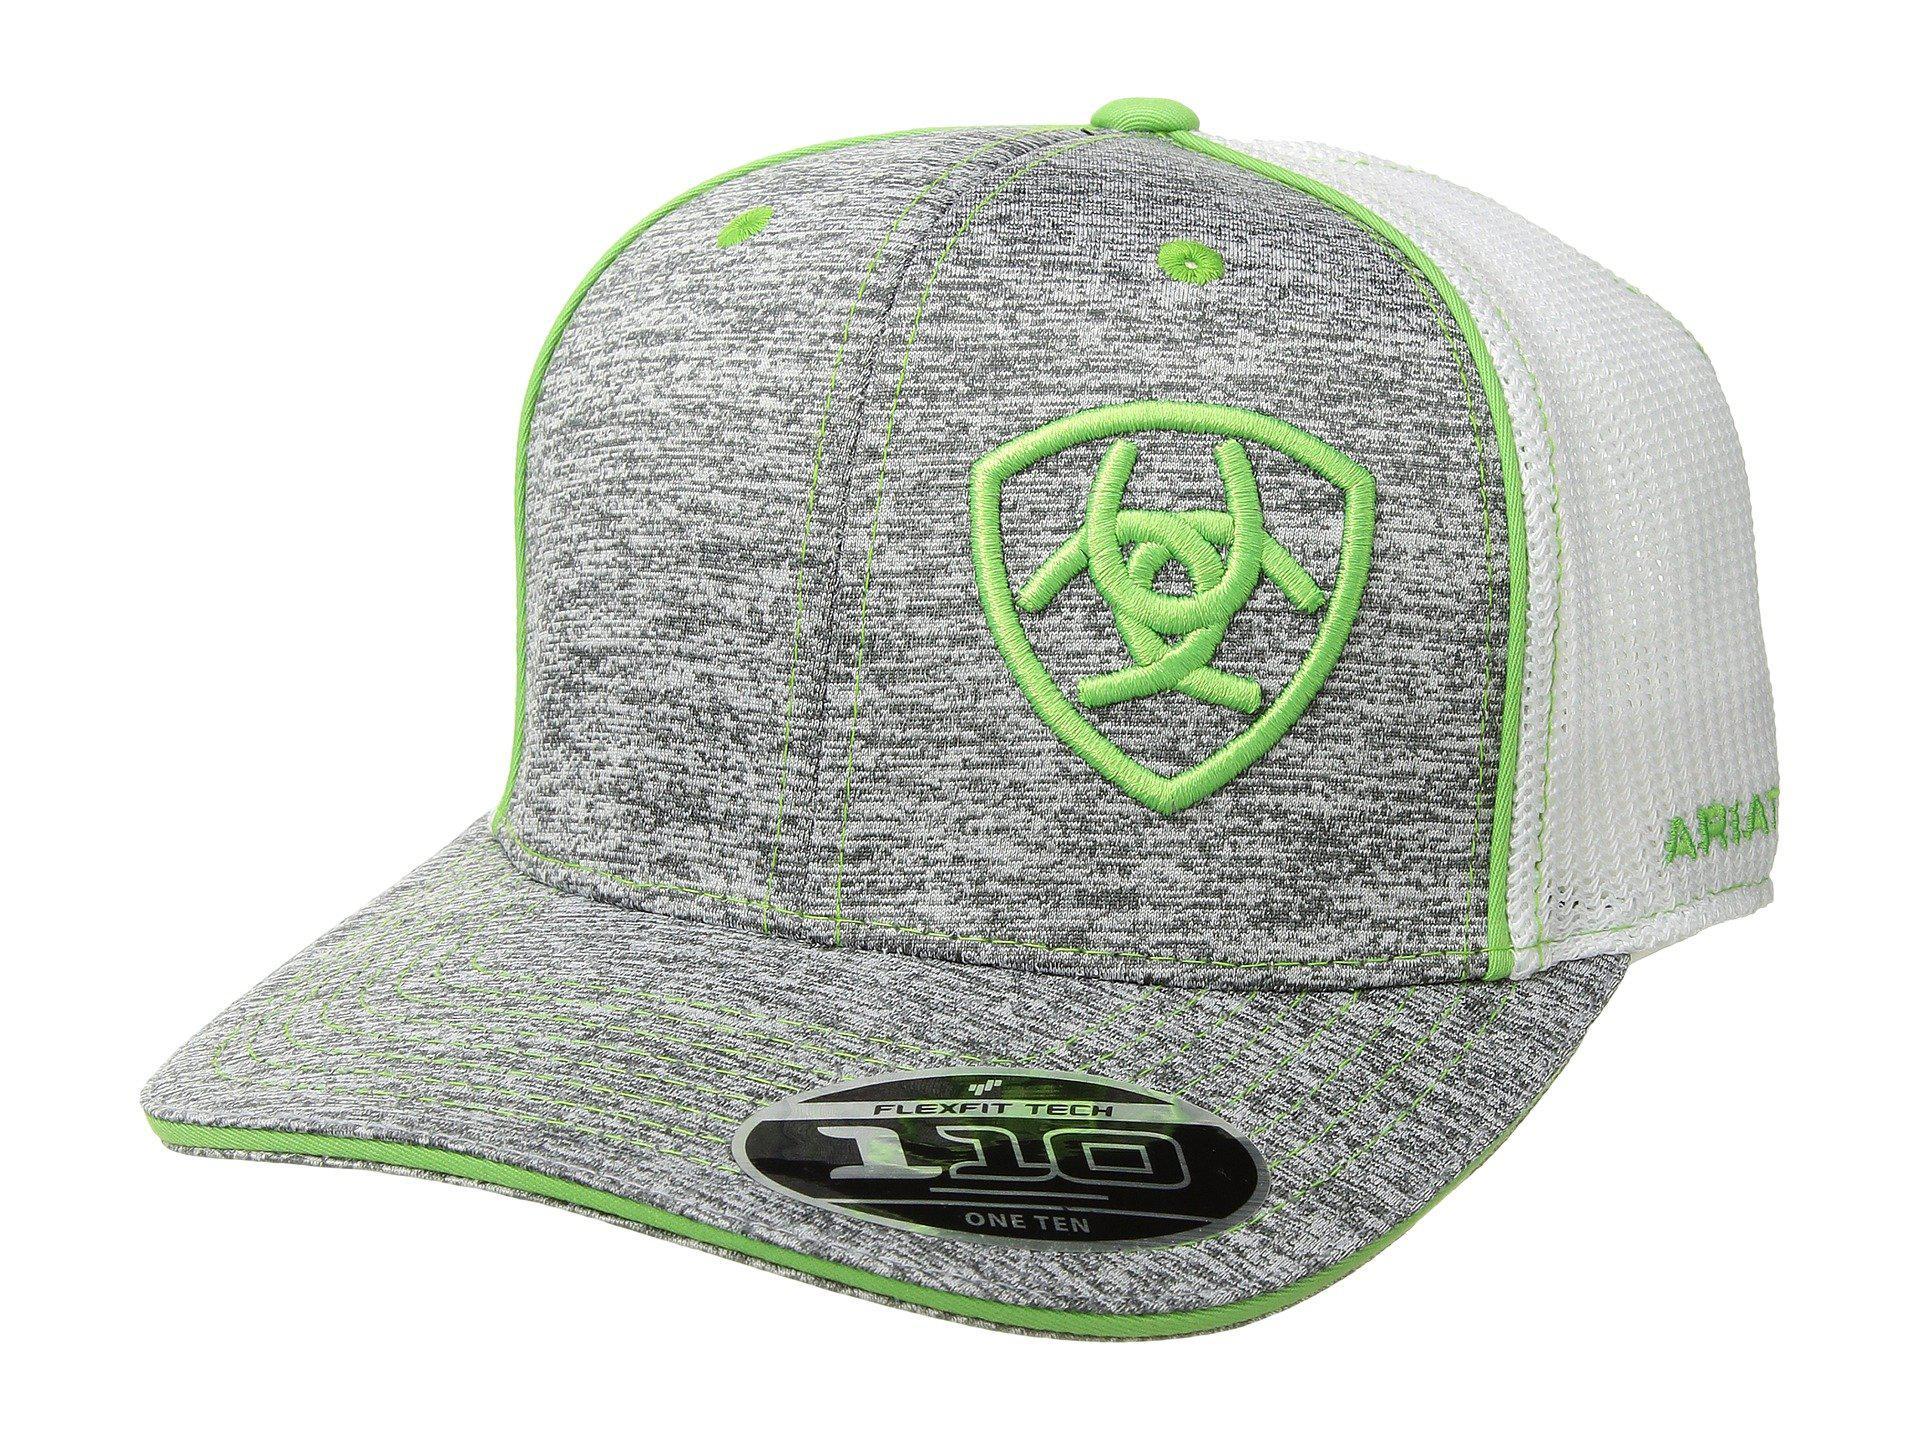 c73eeaf92da Lyst - Ariat Embroidered Shield Flexfit Cap (heather green) Caps for Men